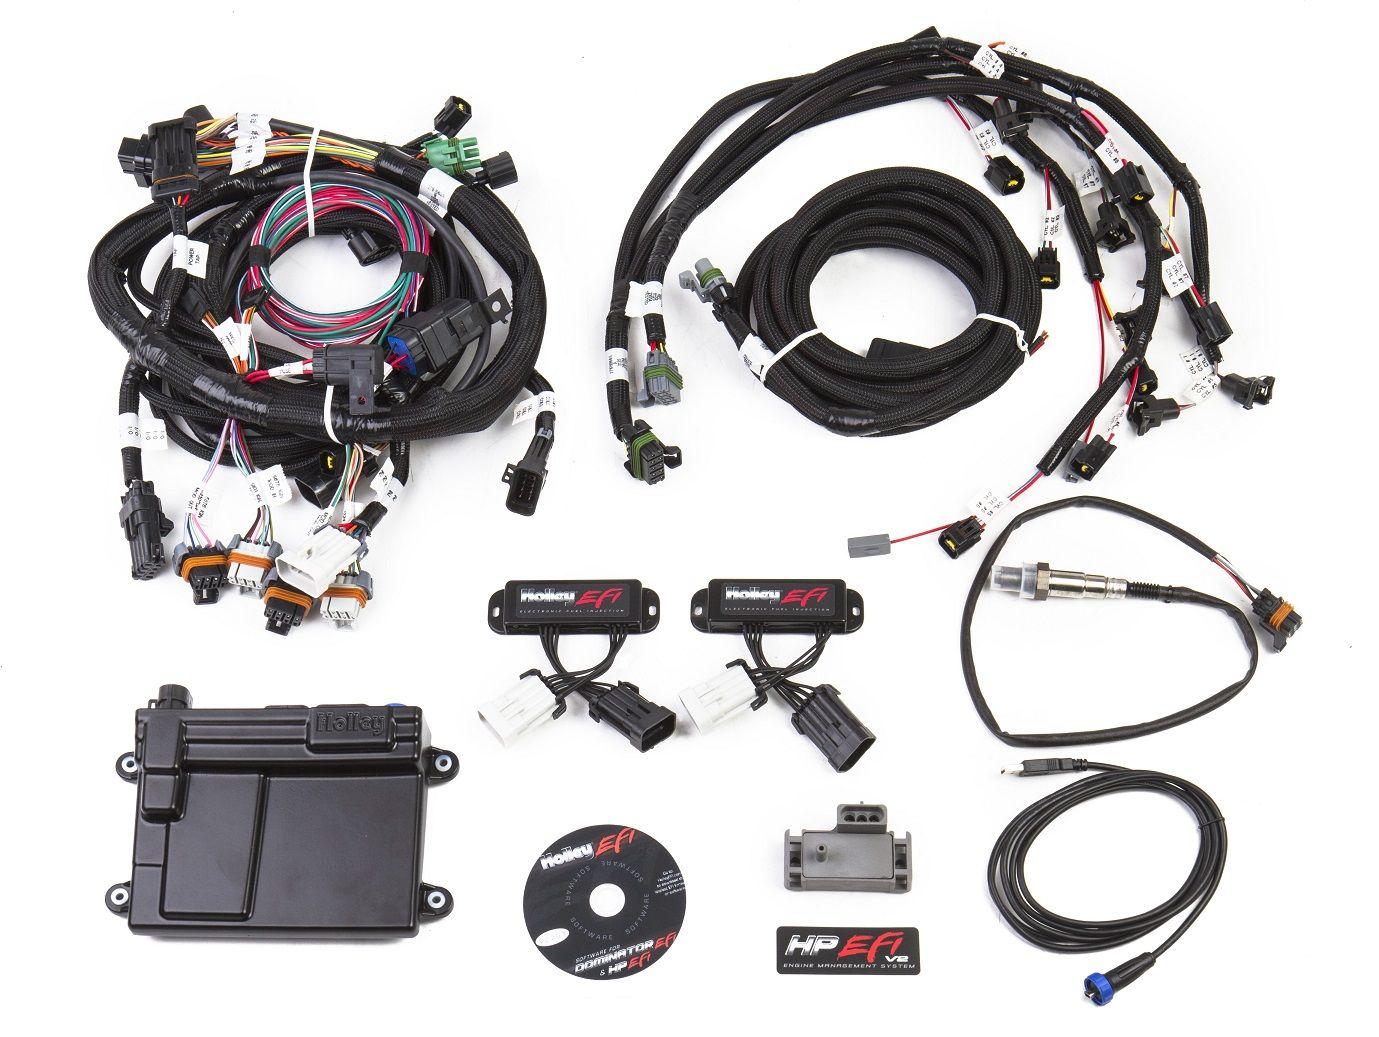 medium resolution of 550 616n hp efi ecu harness kits